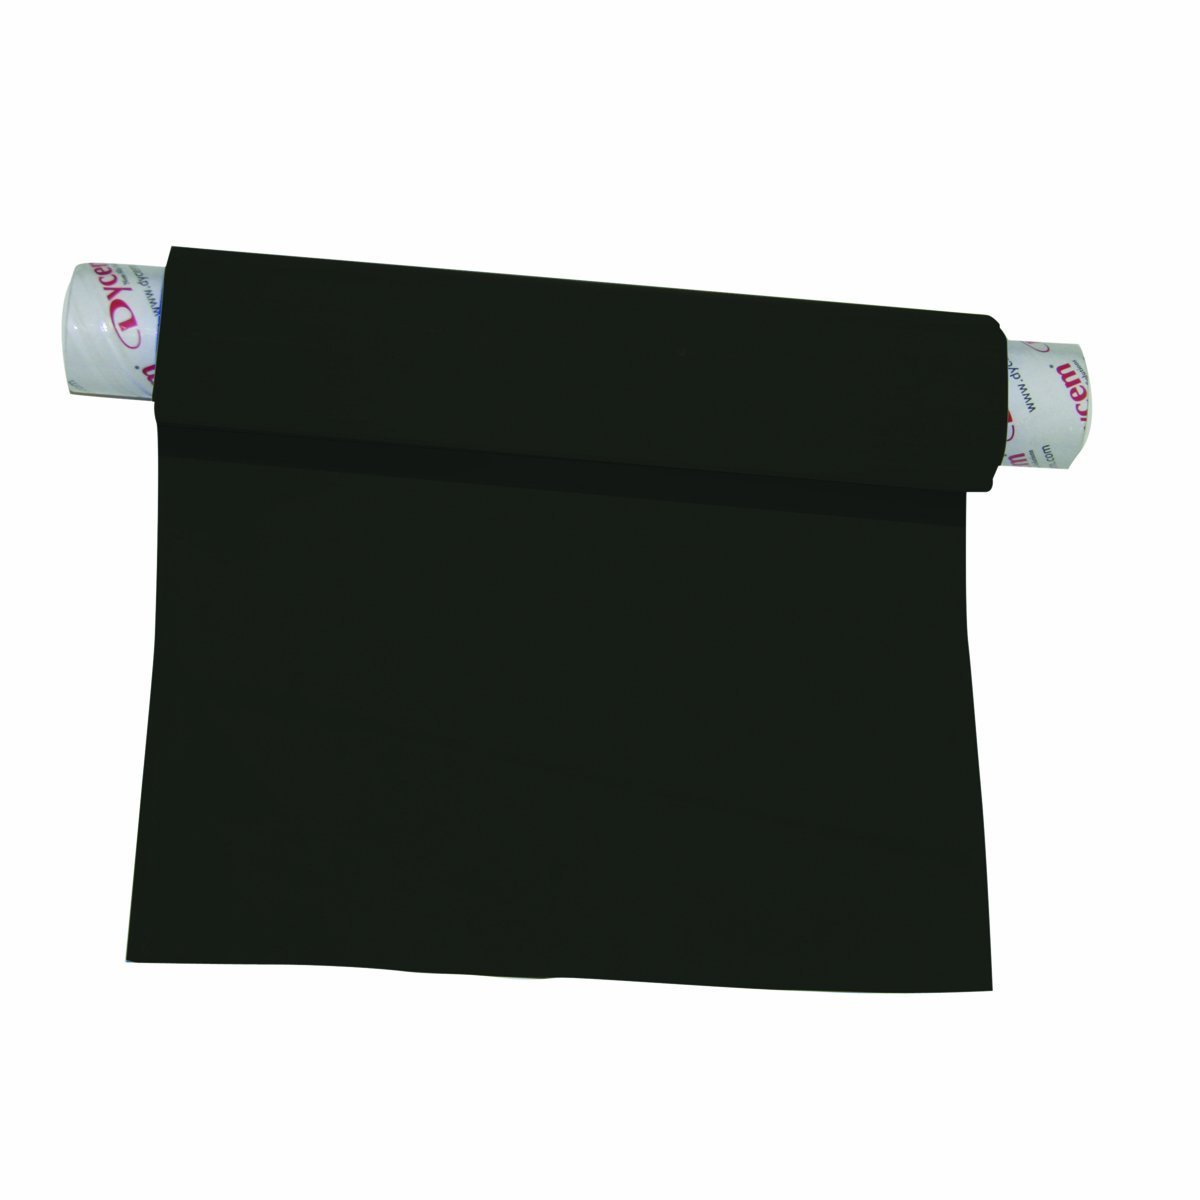 "Dycem Non-Slip Material, Roll, 8"" X3-1/4 Foot, Black"